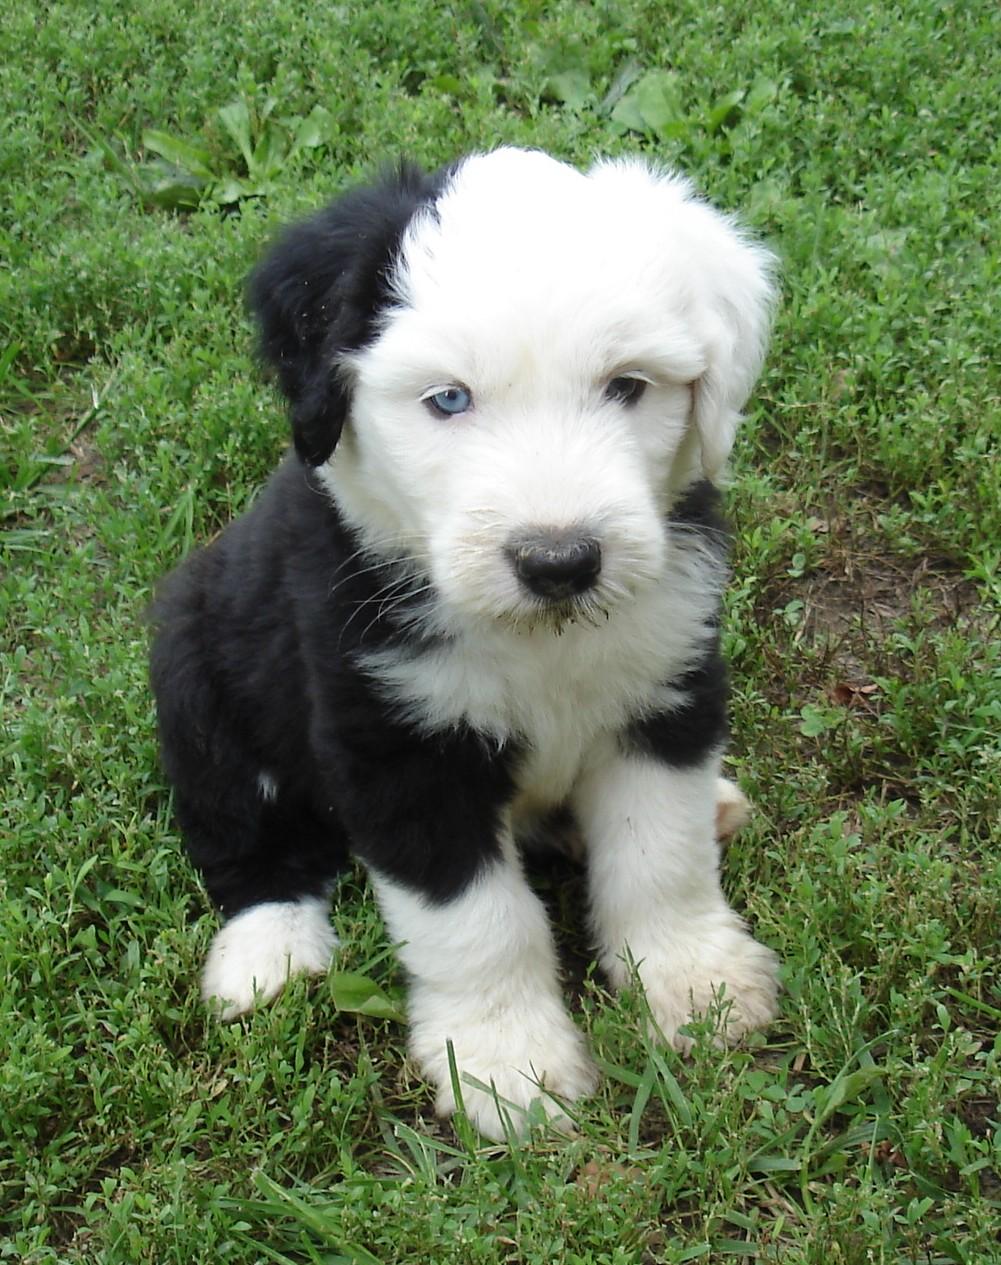 Croatian Sheepdog Puppies: Croatian Old English Sheepdog Puppy Breed